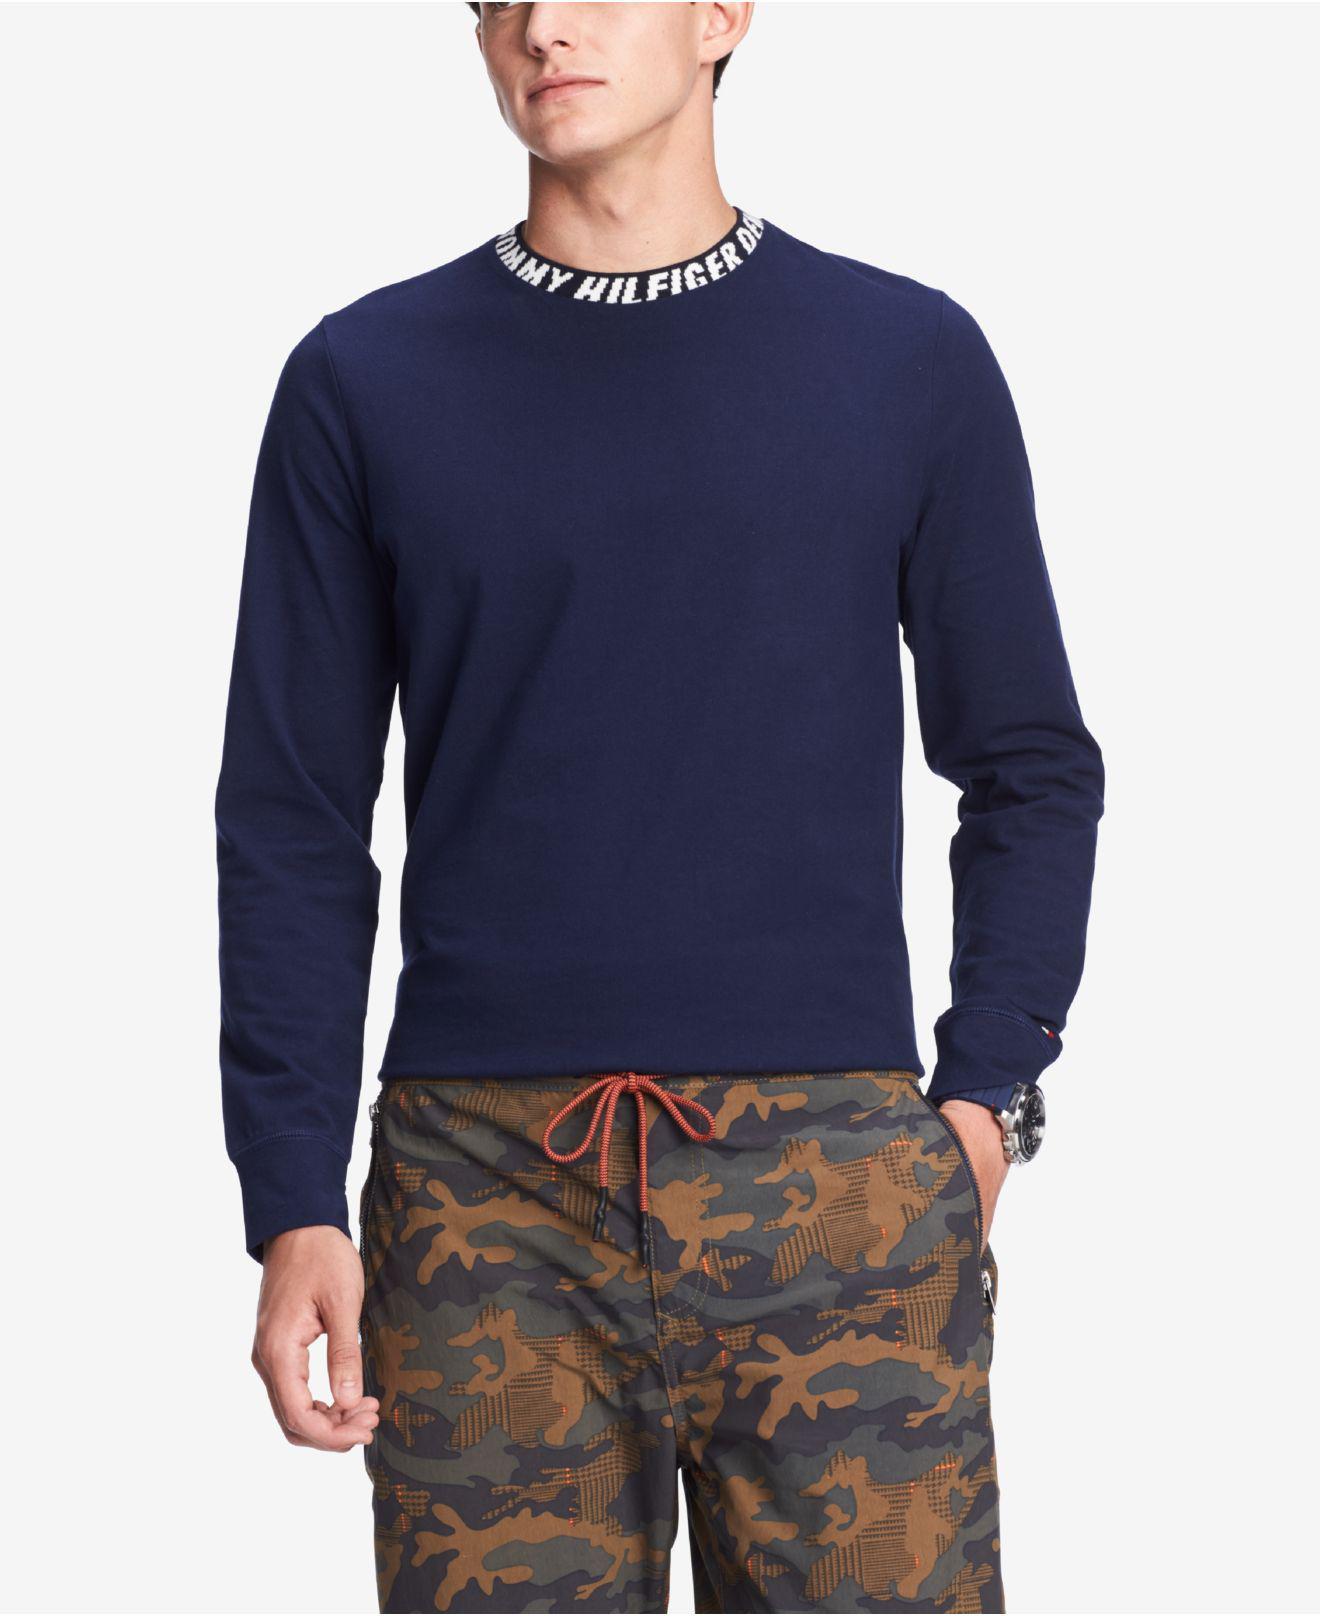 5df777ab0b05a4 Tommy Hilfiger. Men s Blue Theo Shirt